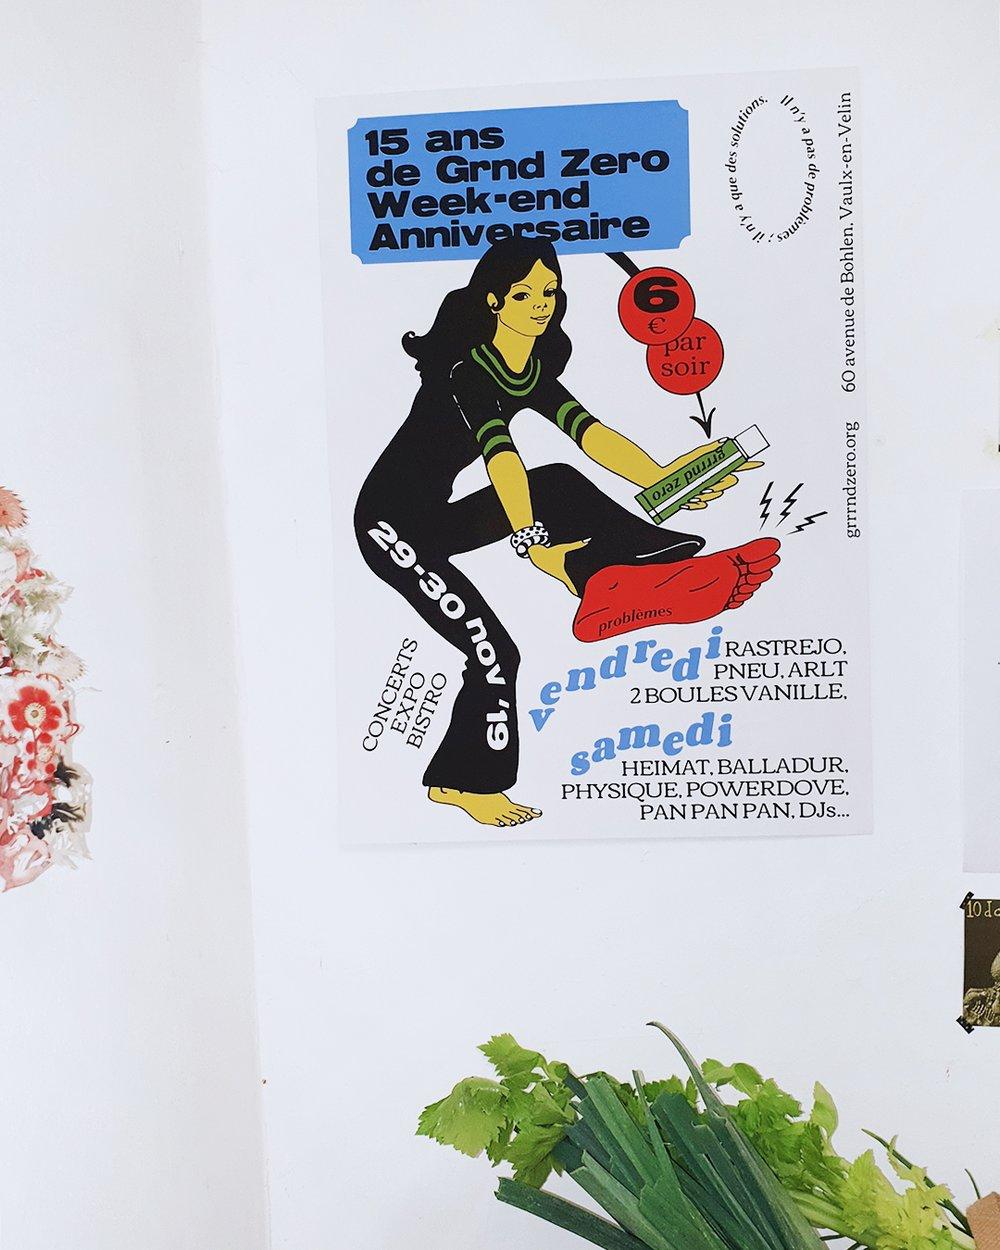 Anniversaire Grrrnd Zero screen printed poster